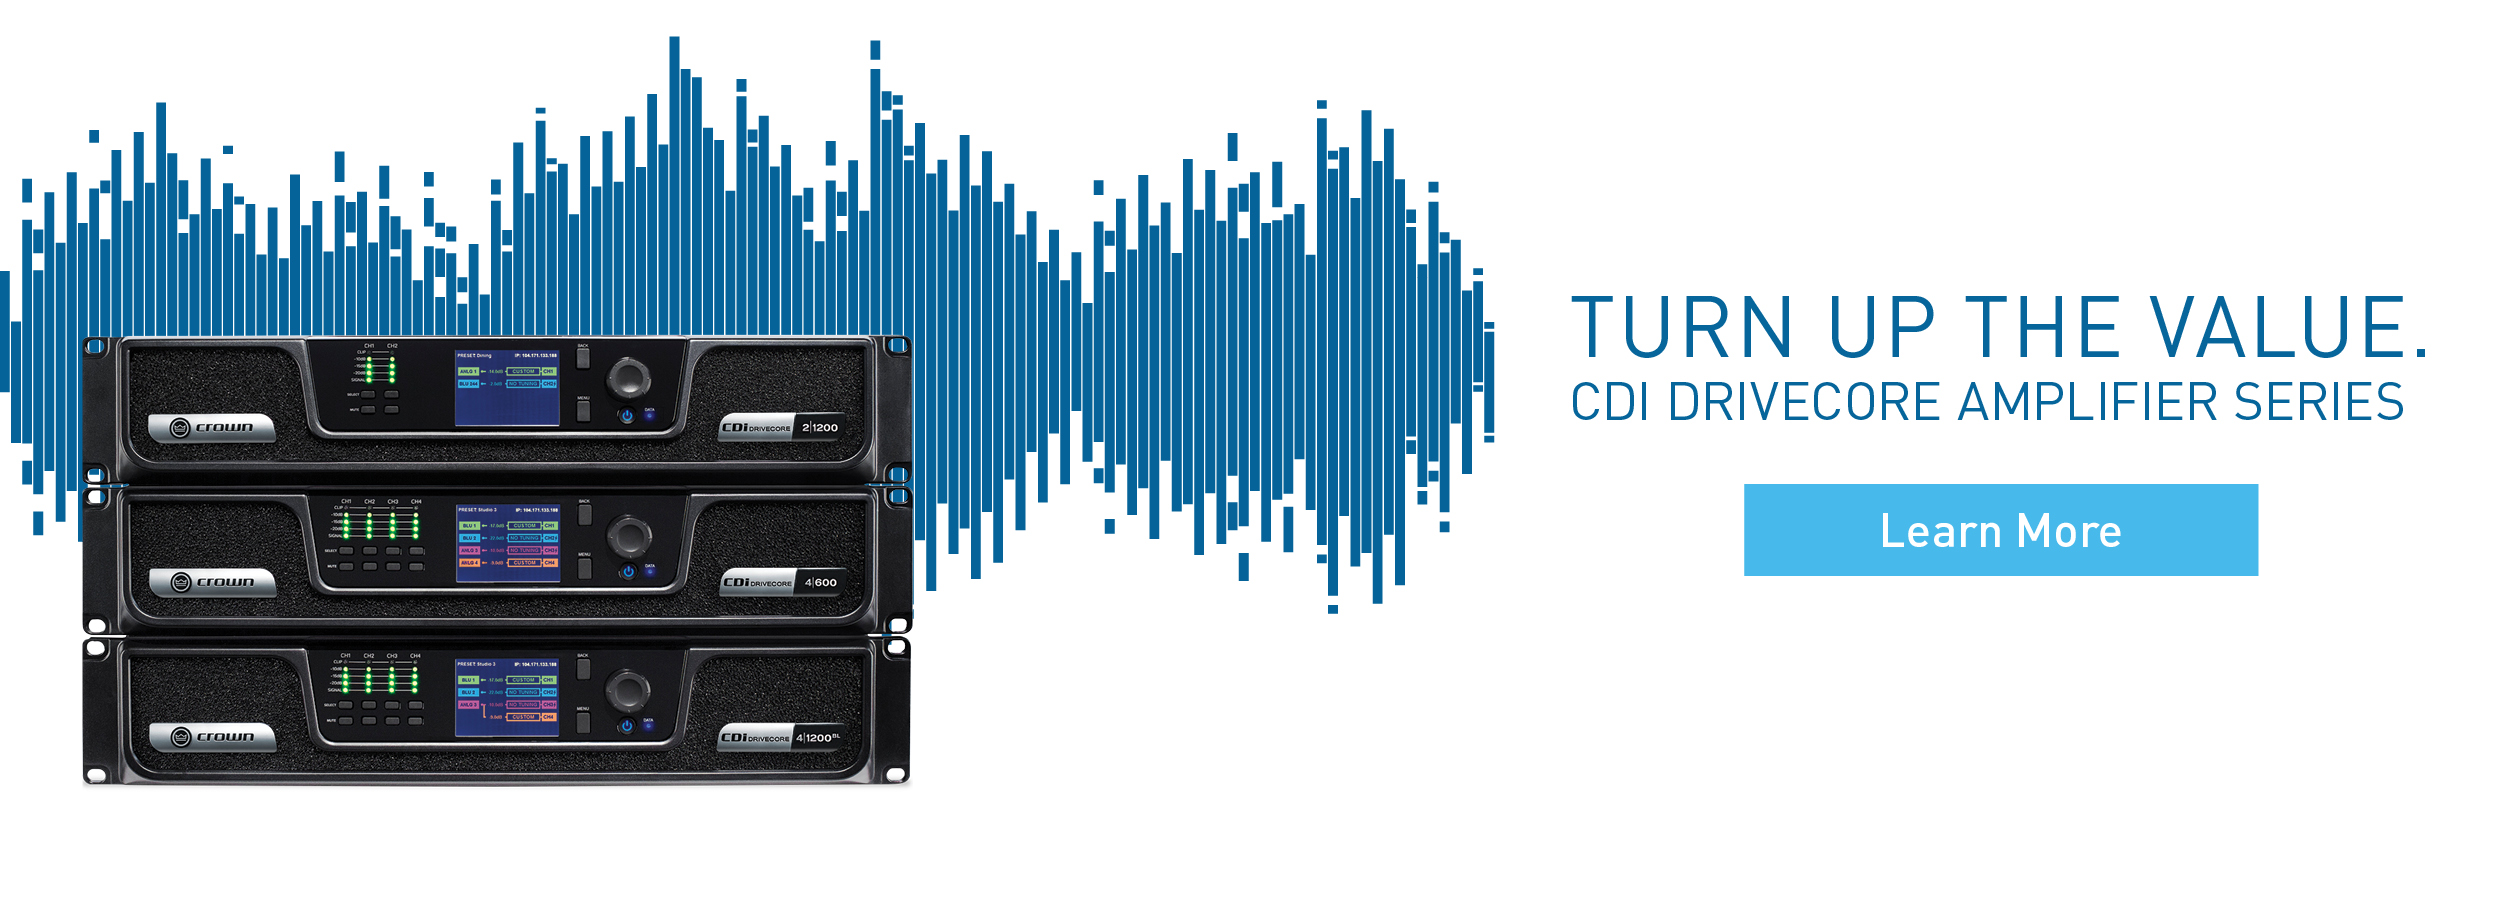 CDi DriveCore Series Landing Page 2017